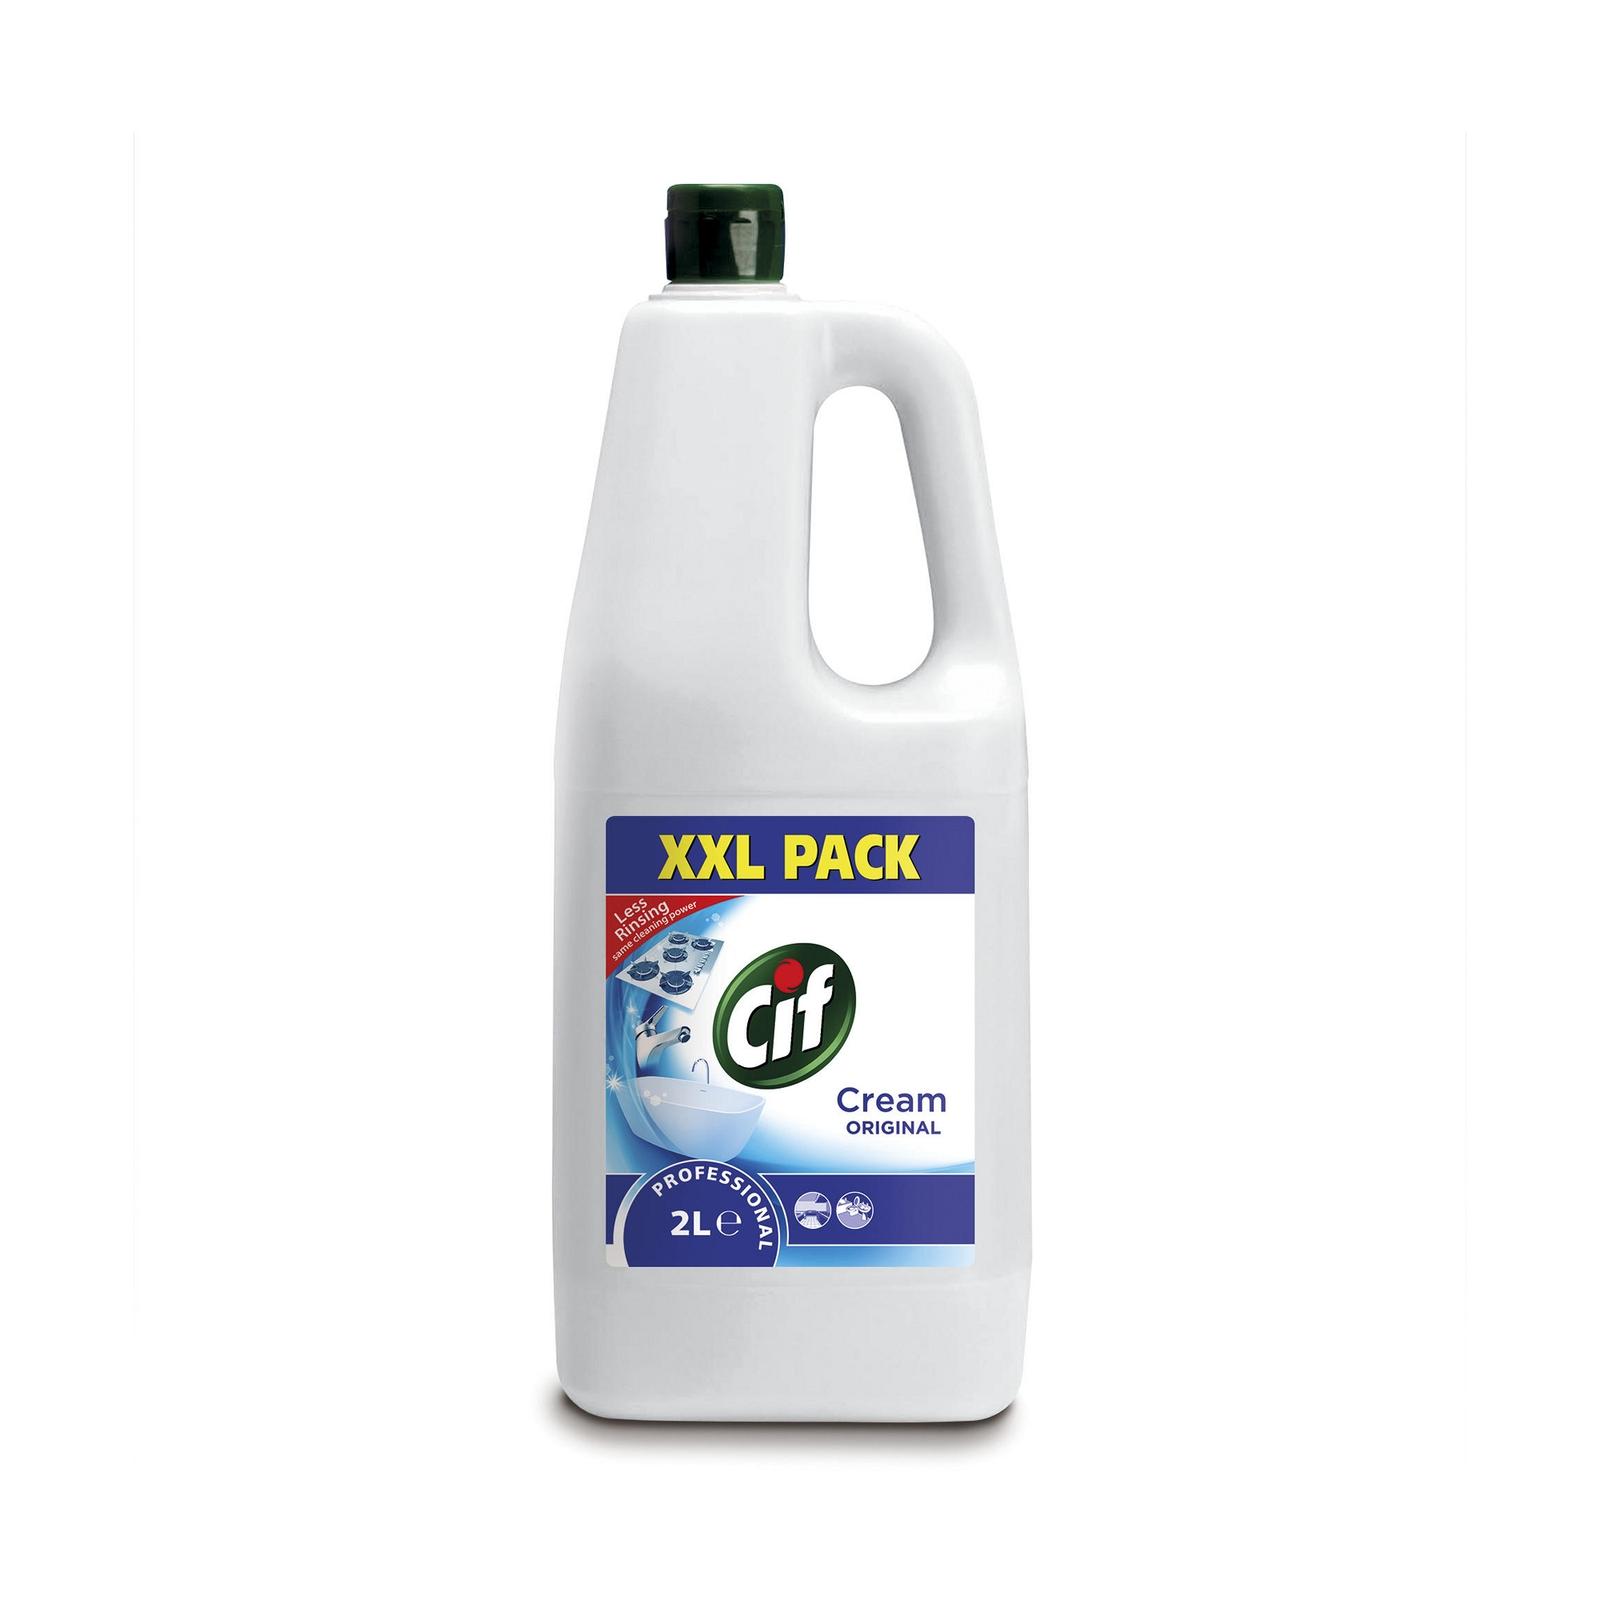 Cif Pro Formula Cream Cleaner